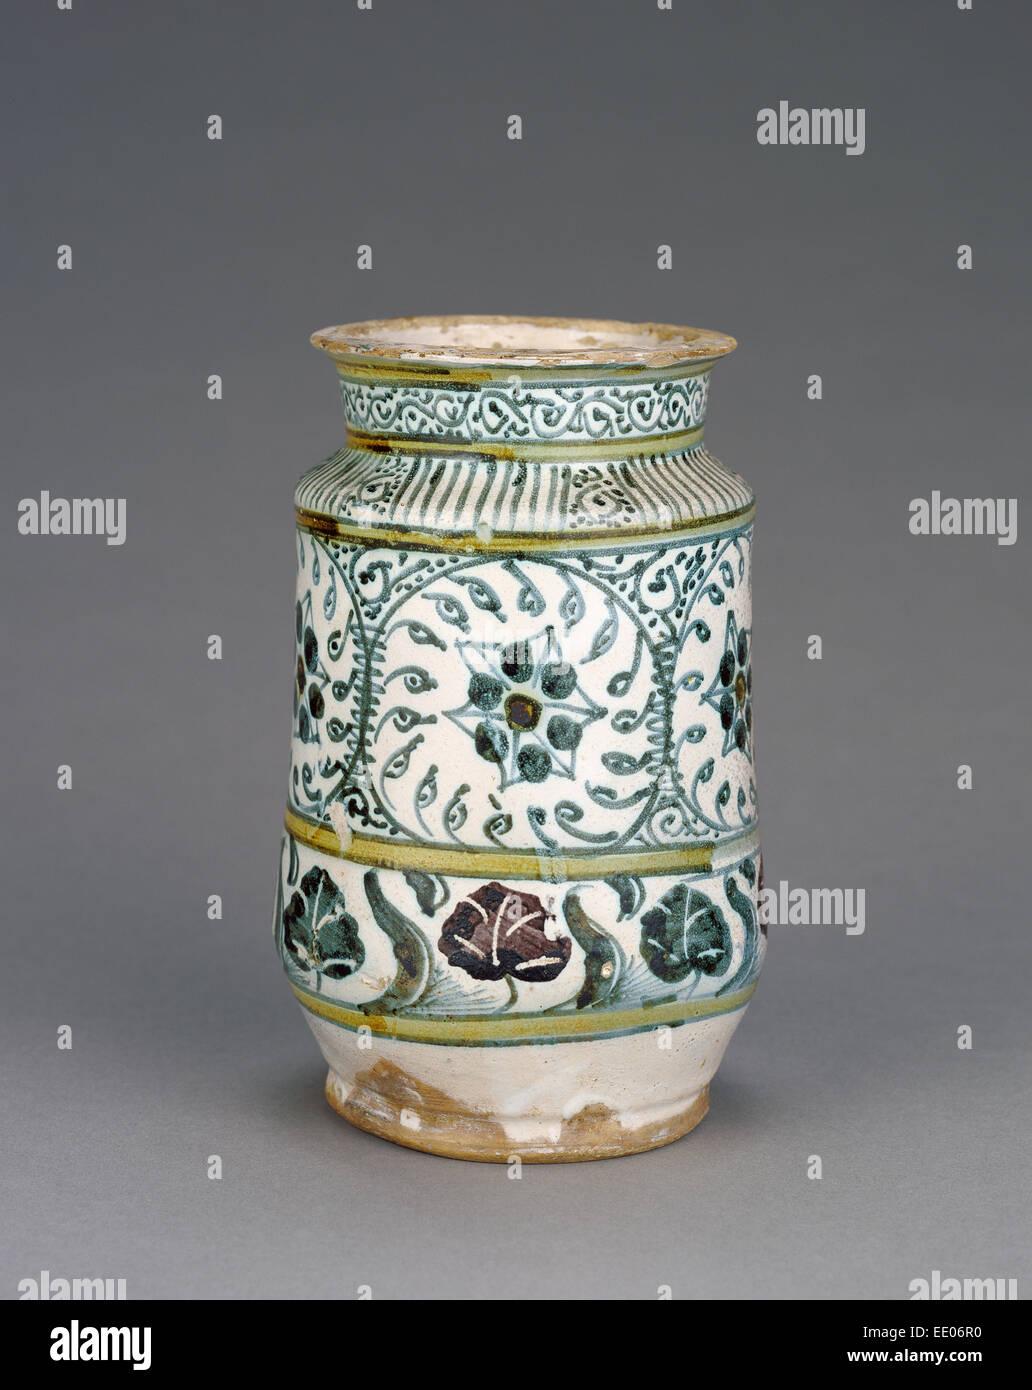 Alte Berufe 19tes Jahrhundert Albarello Italien Montelupo Flaschen & Gefäße